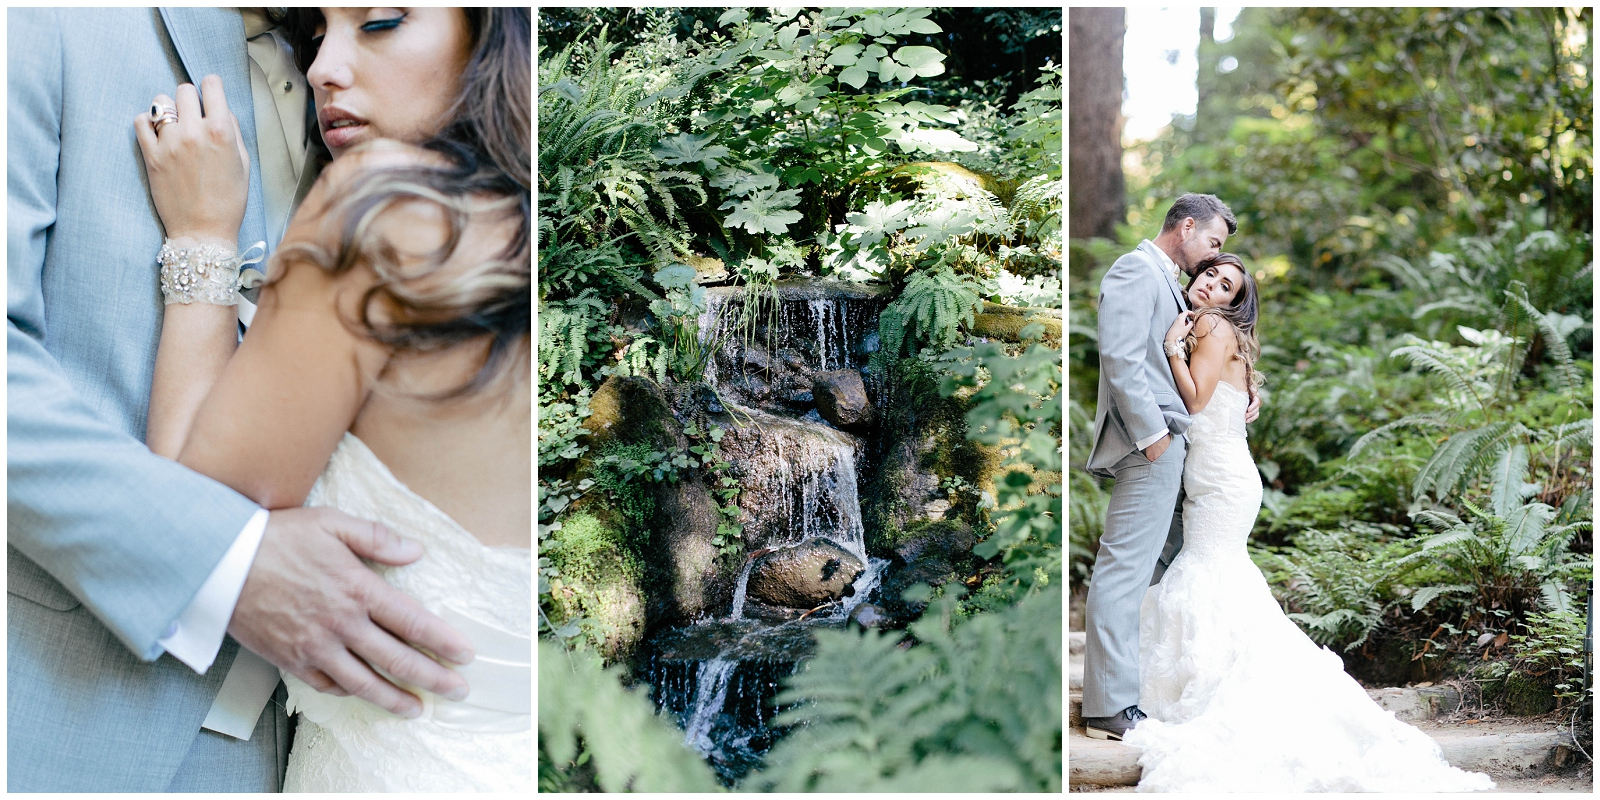 San-Francisco-Bay-Area-Wedding-Photography_Nestle_Down_2.jpg